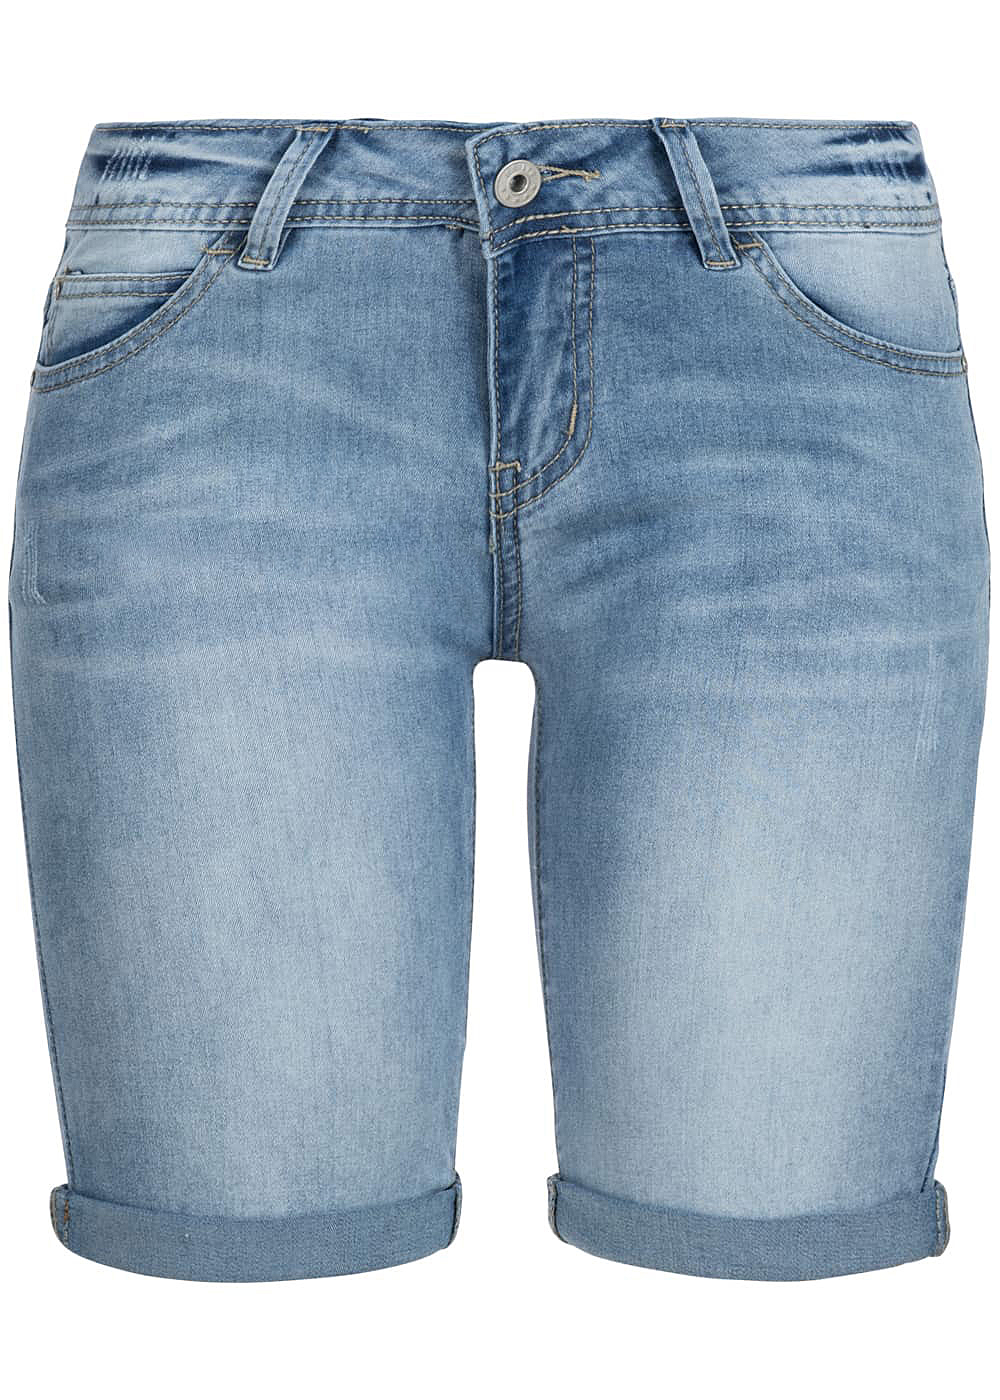 hailys damen bermuda jeans short 5 pockets hell blau. Black Bedroom Furniture Sets. Home Design Ideas